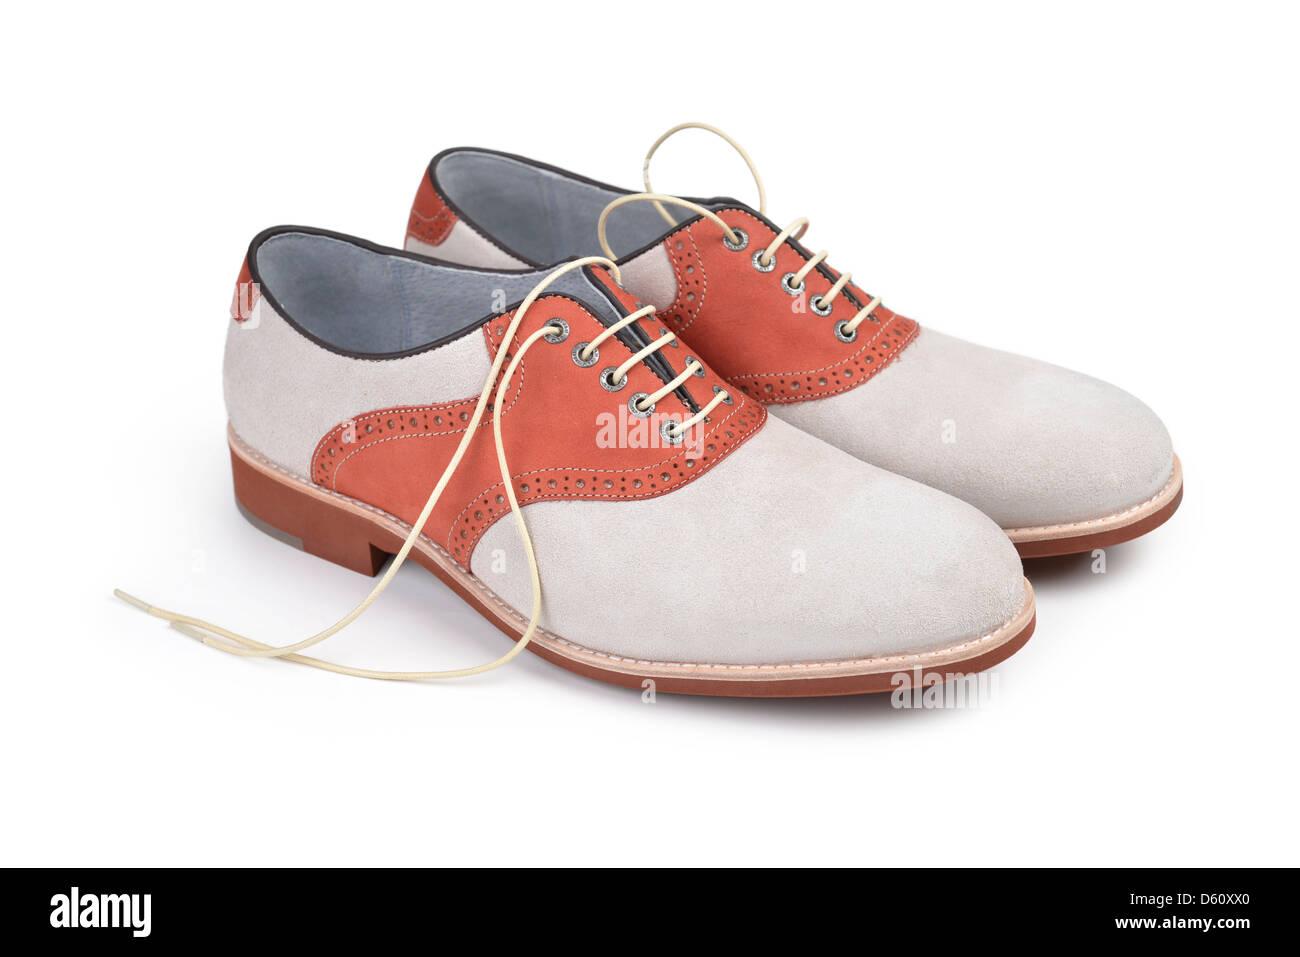 Men's Shoes Stock Photo: 55340152 Alamy